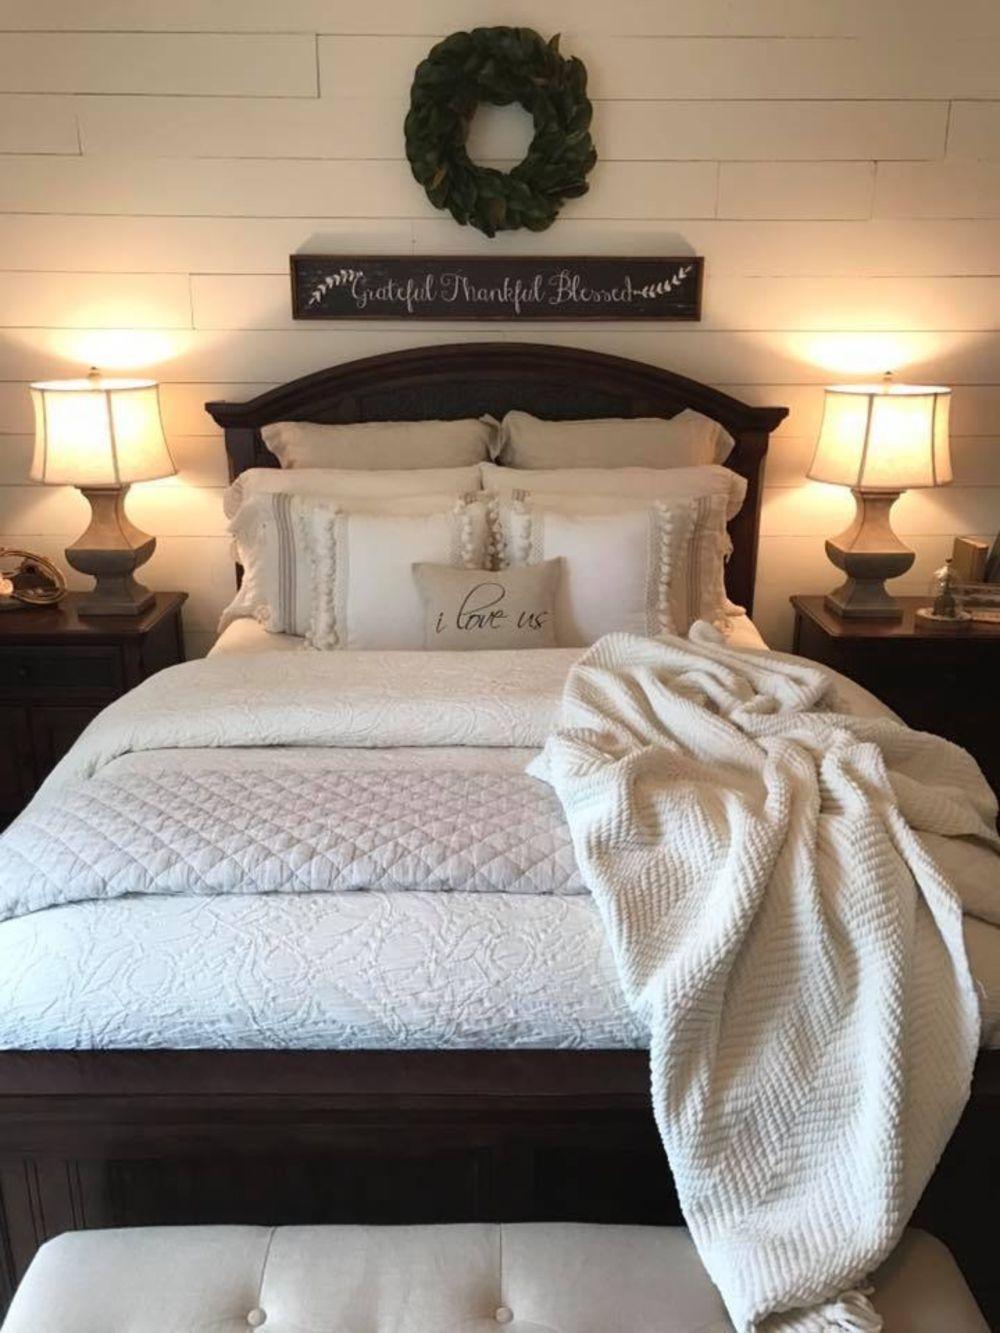 Breathtaking master bedroom design with beautiful - Breathtaking 53 Beautiful Urban Farmhouse Master Bedroom Remodel Https Cooarchitecture Com